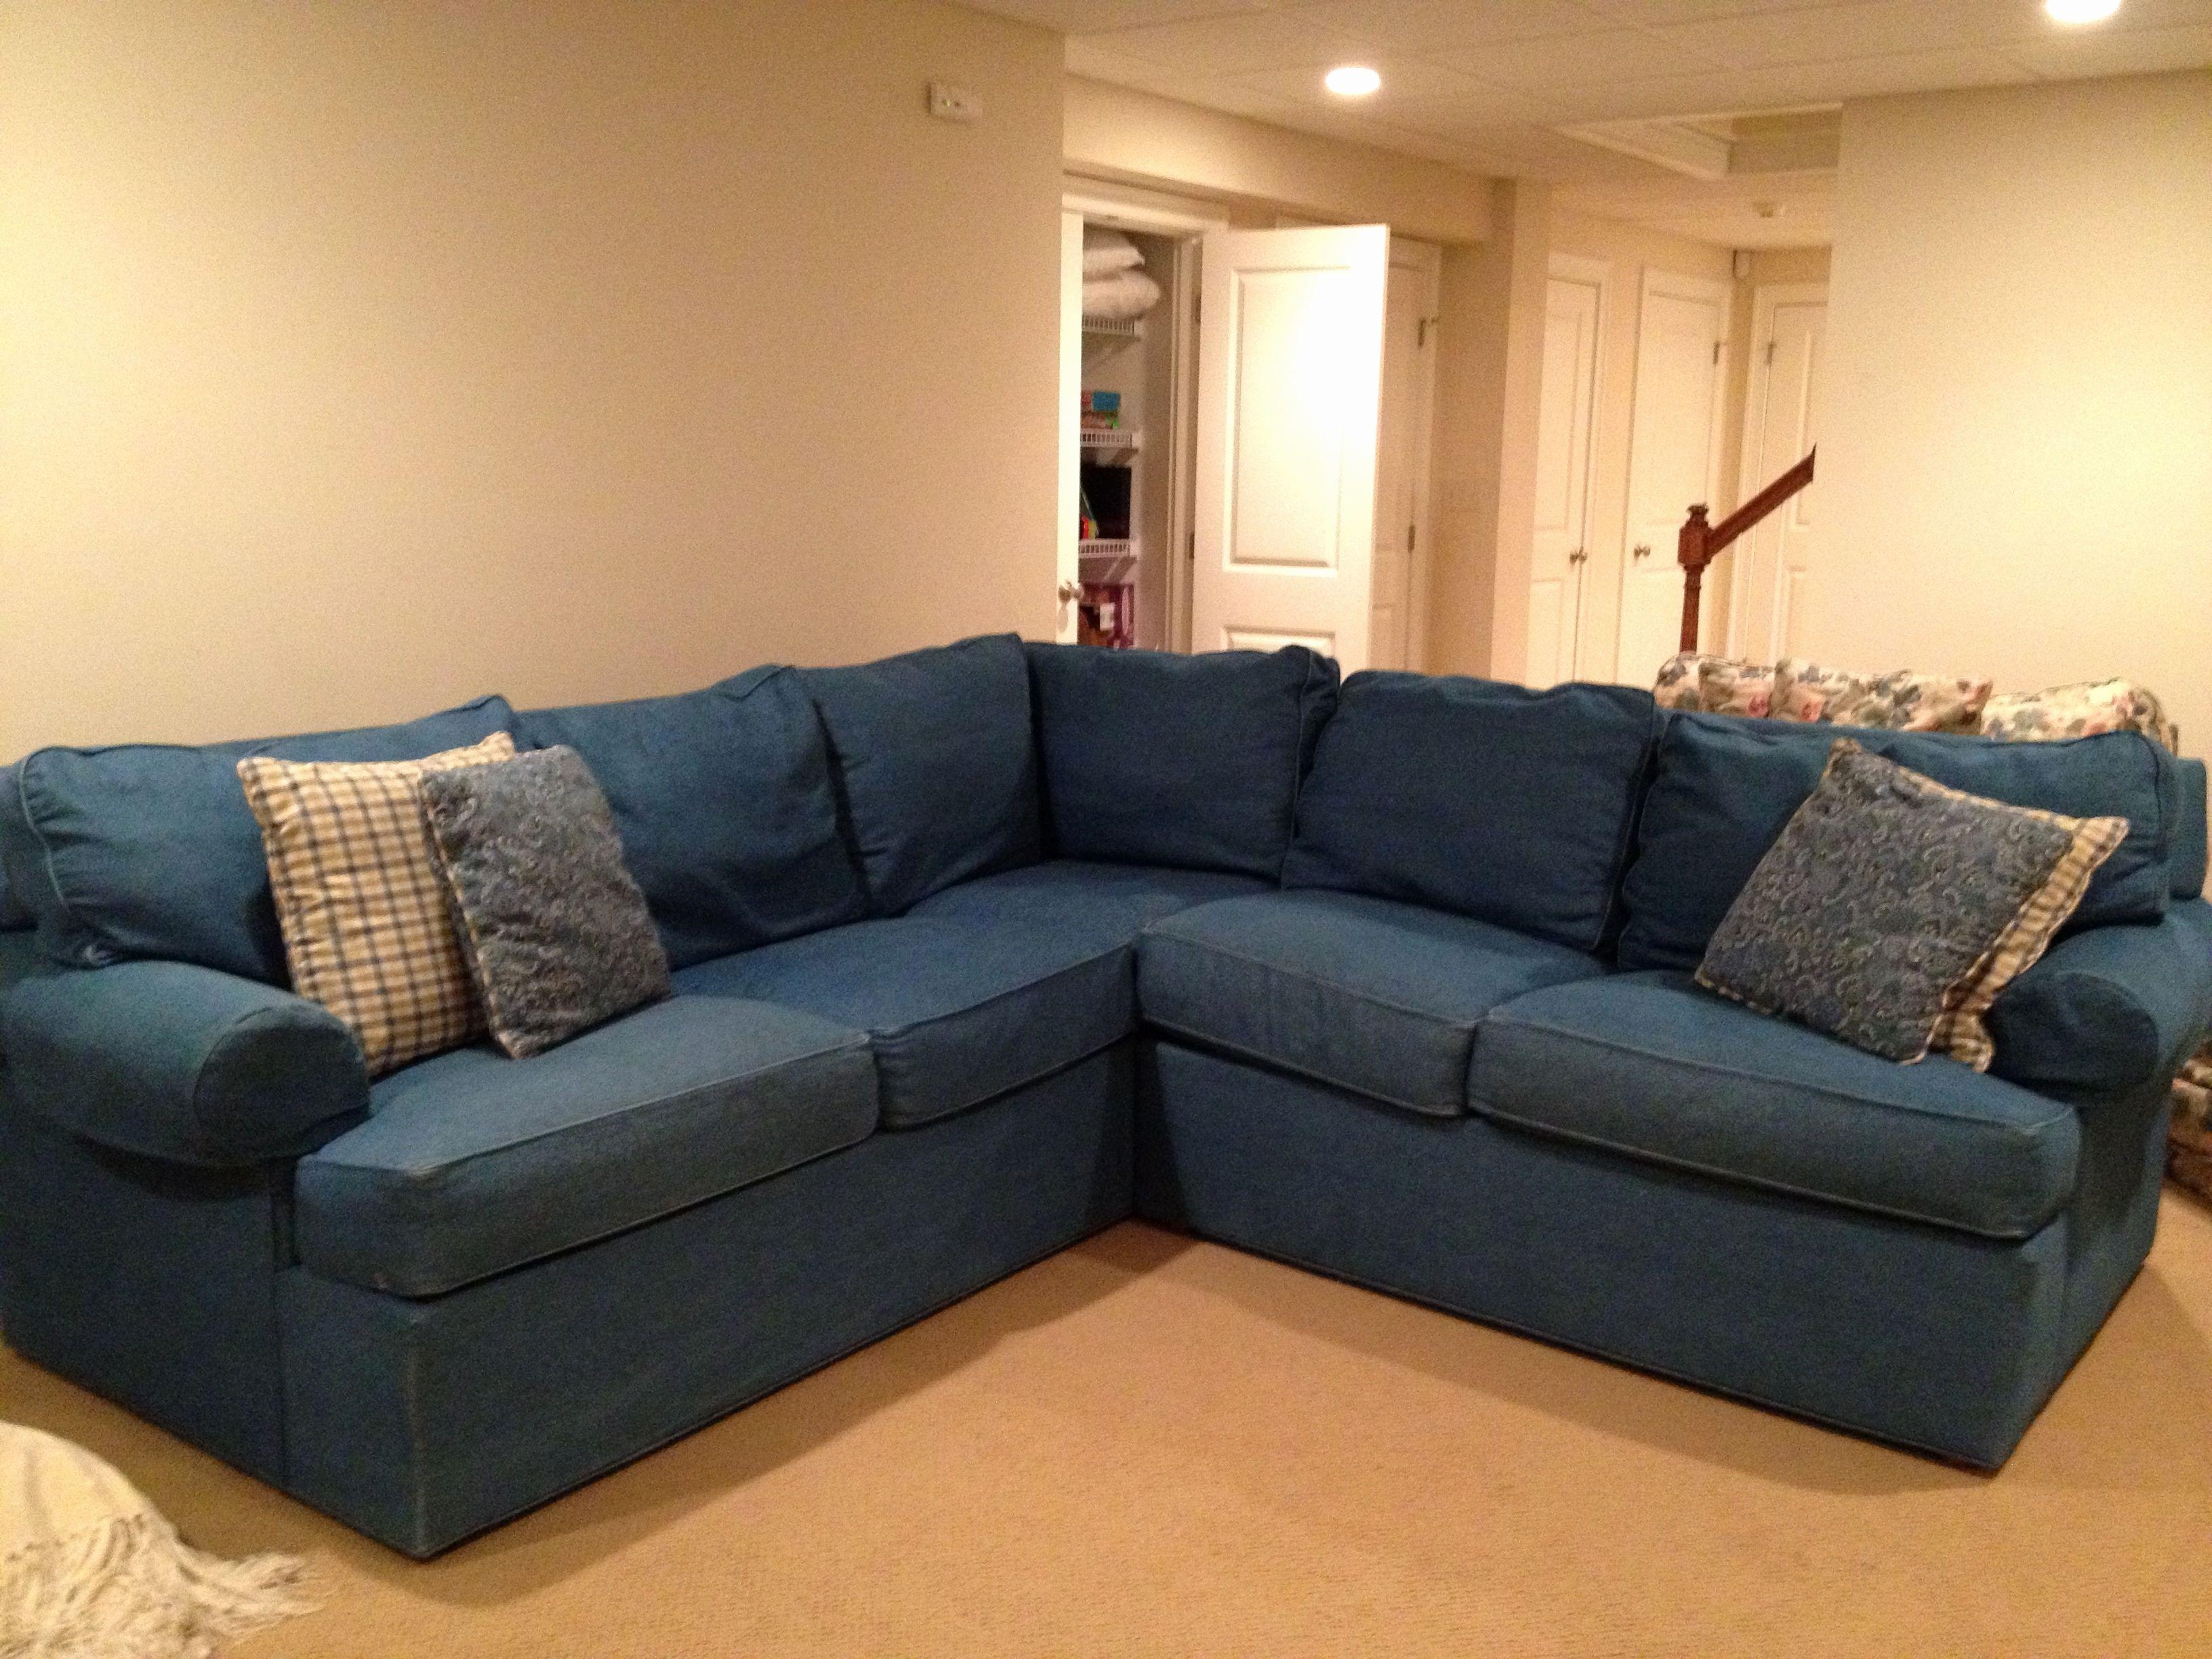 Best Of Sectional sofas Okc Photographs Sectional sofas Okc ...